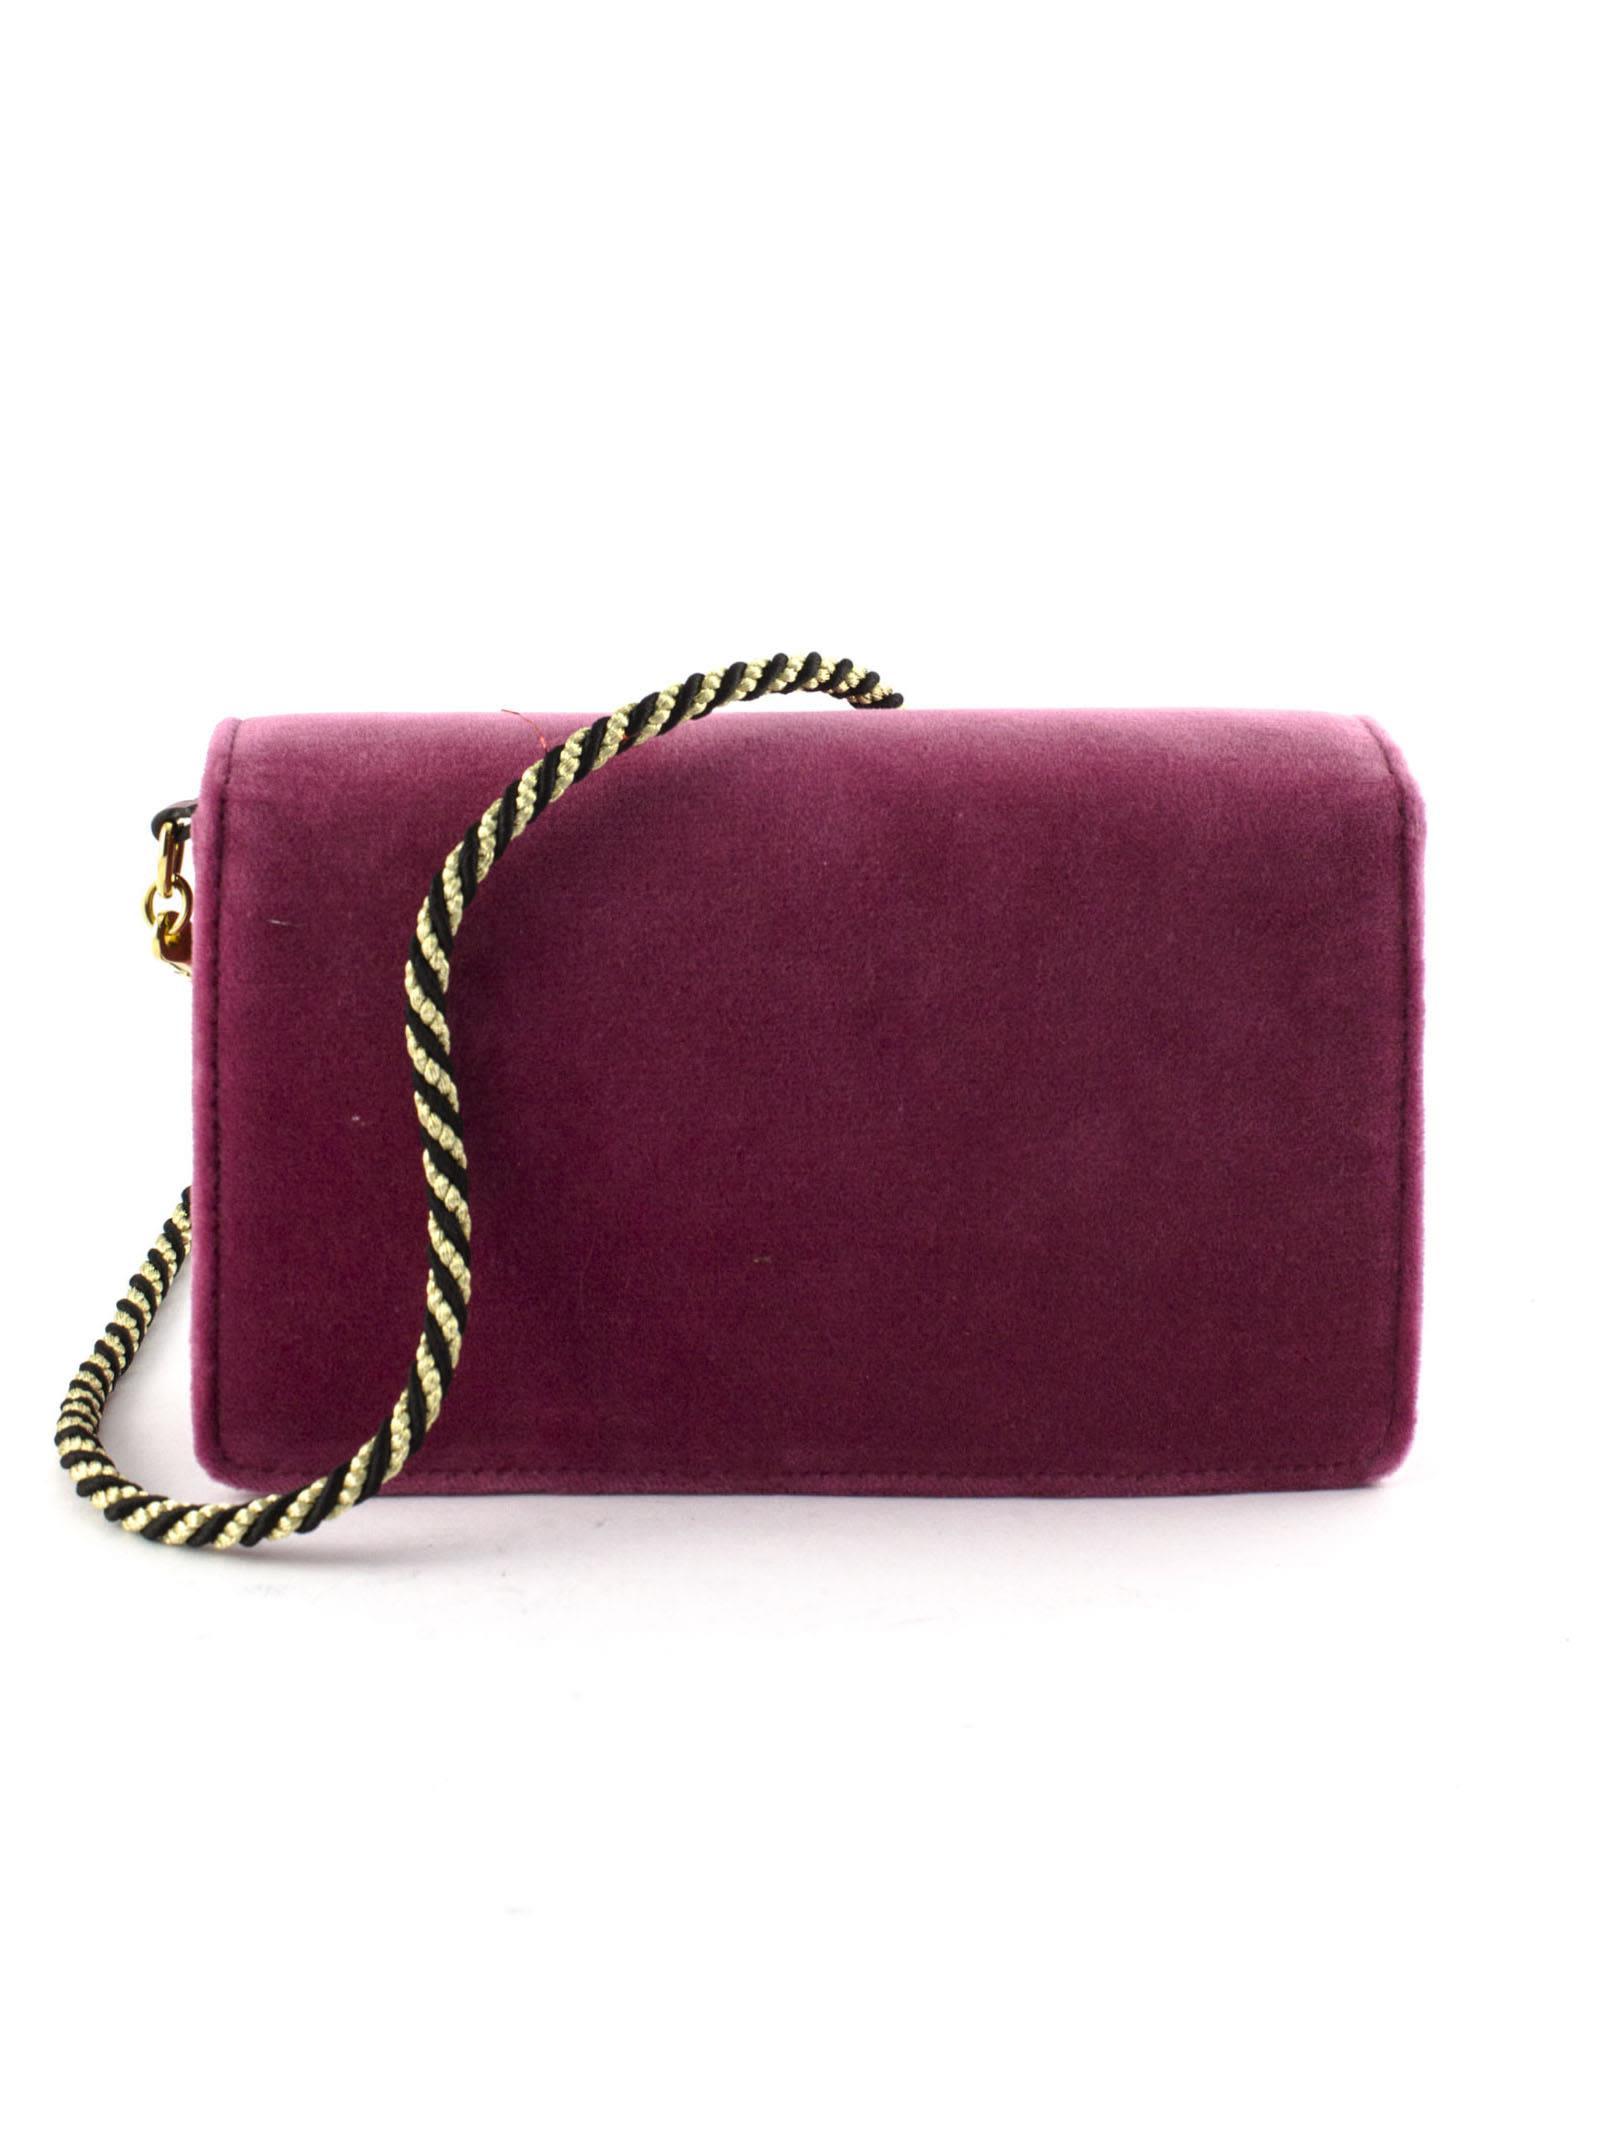 c010d1c1c694 Gucci Gucci Pink Velvet Shoulder Bag - Rosa - 10935262